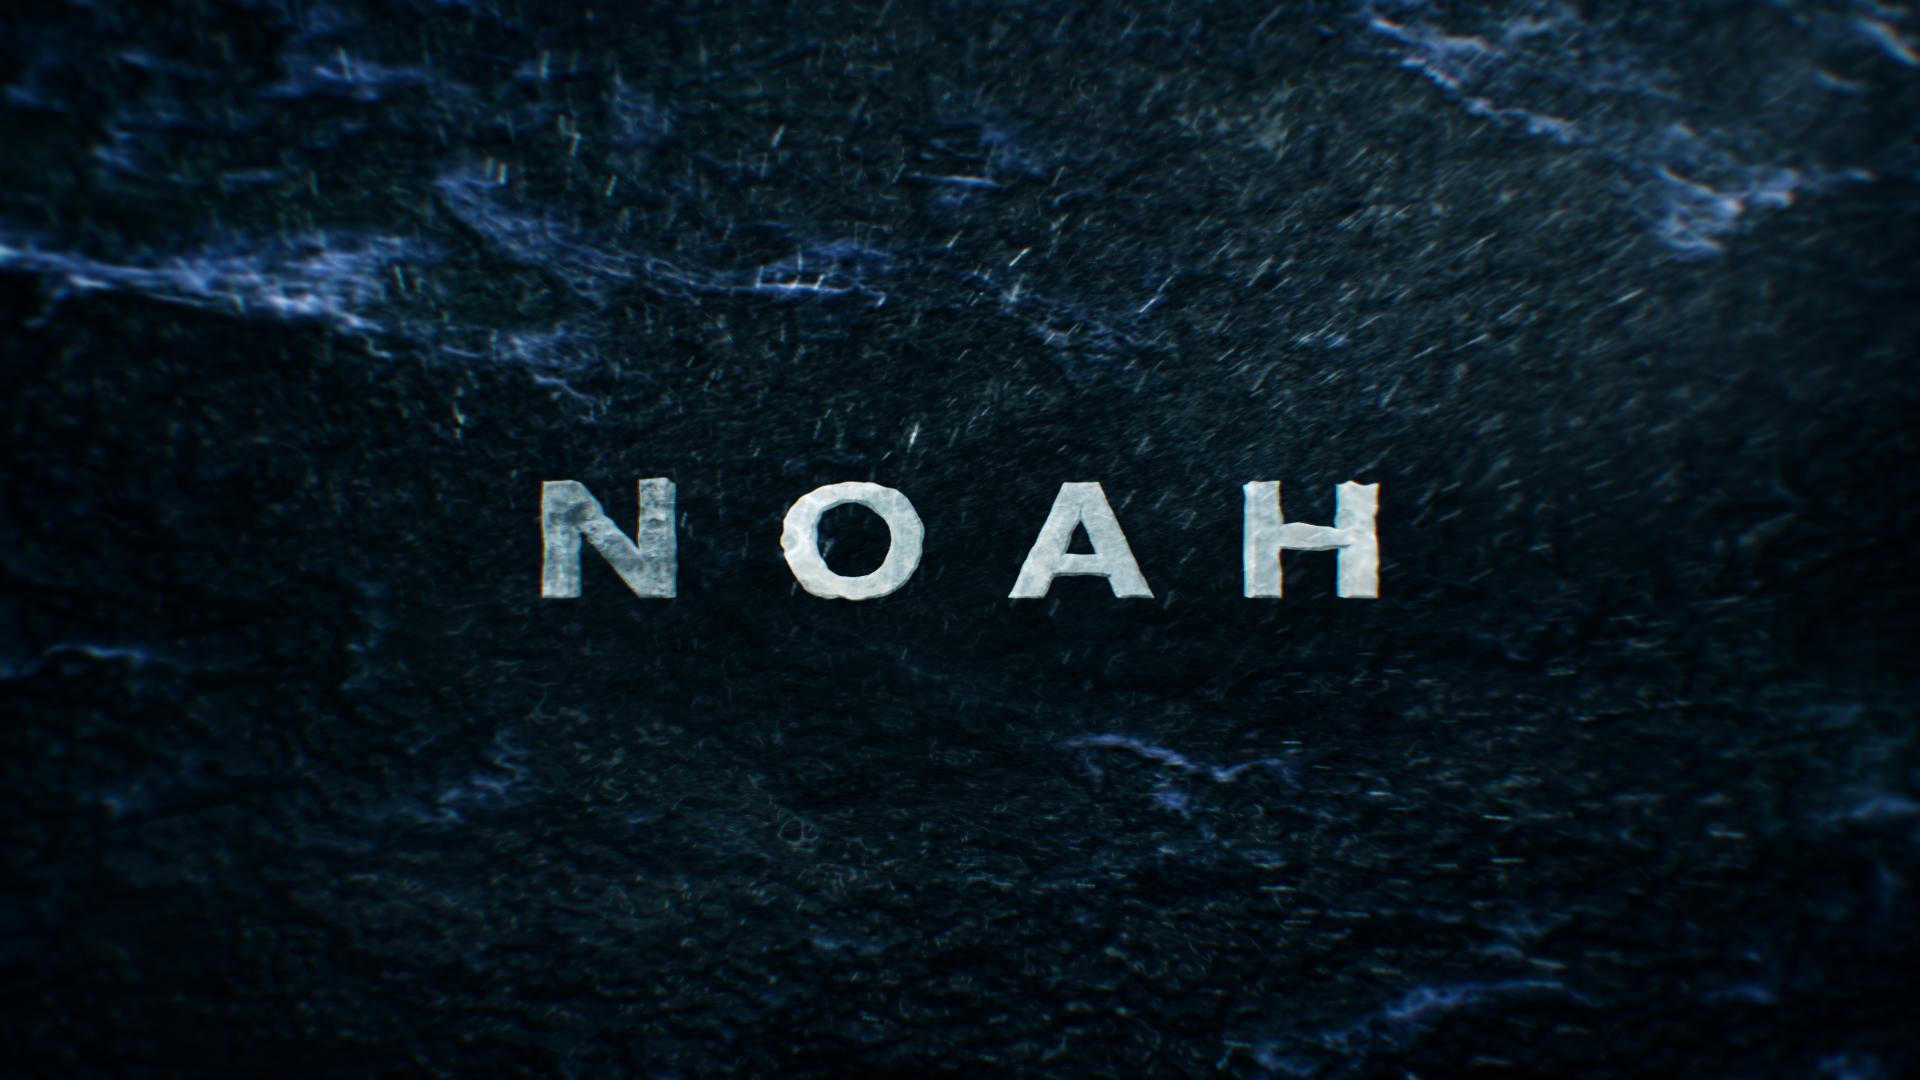 Noah_Title_02_03_03.jpg